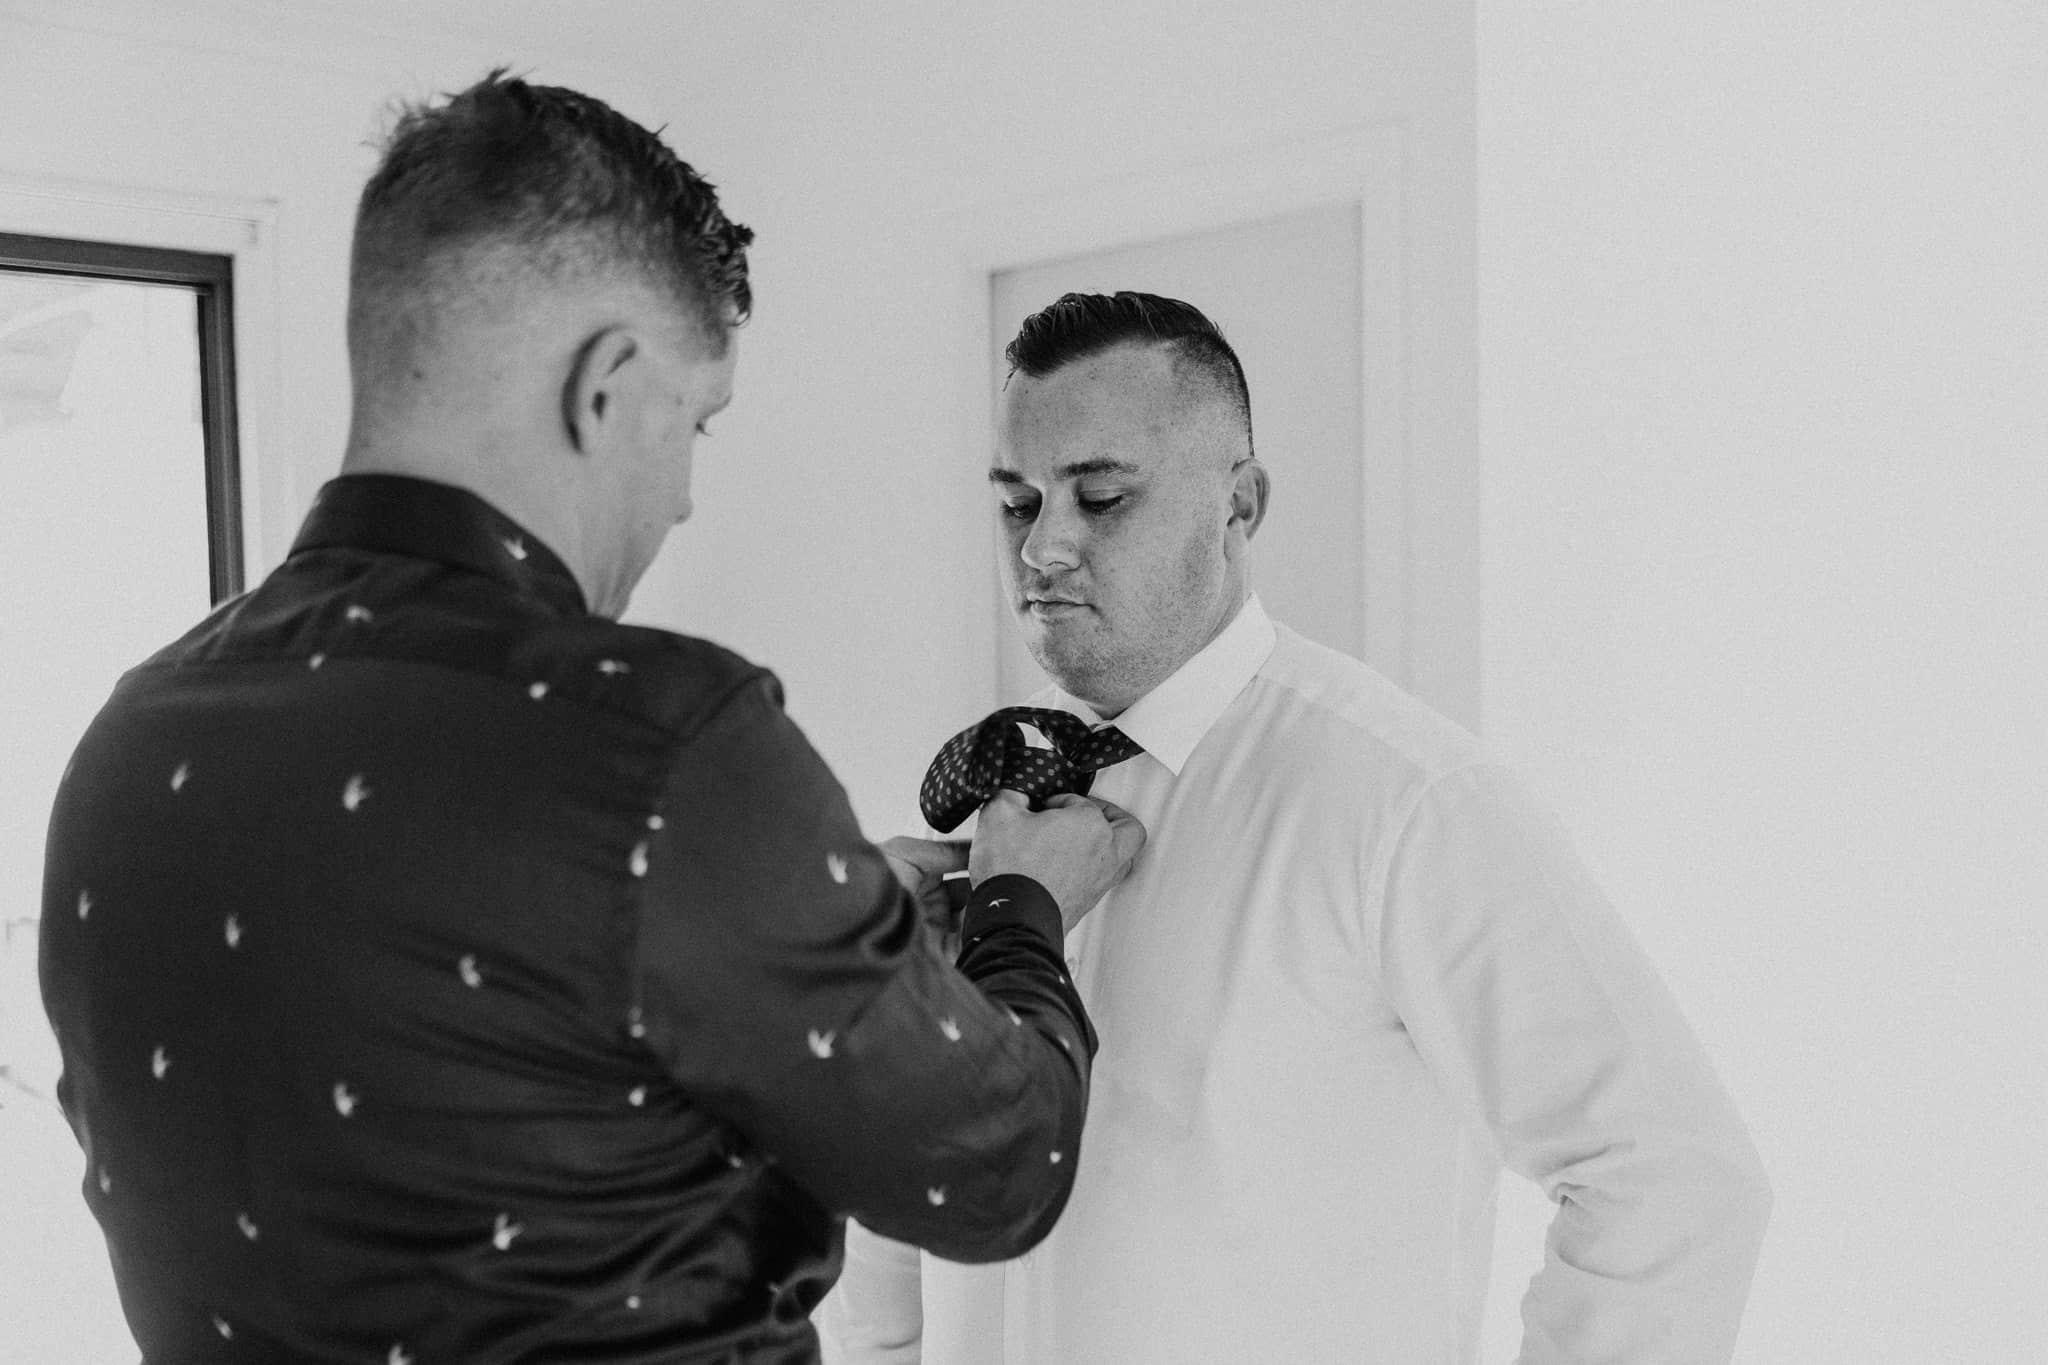 Groomsmen helps do tie Captured by James White Hunter Valley Wedding Photographer